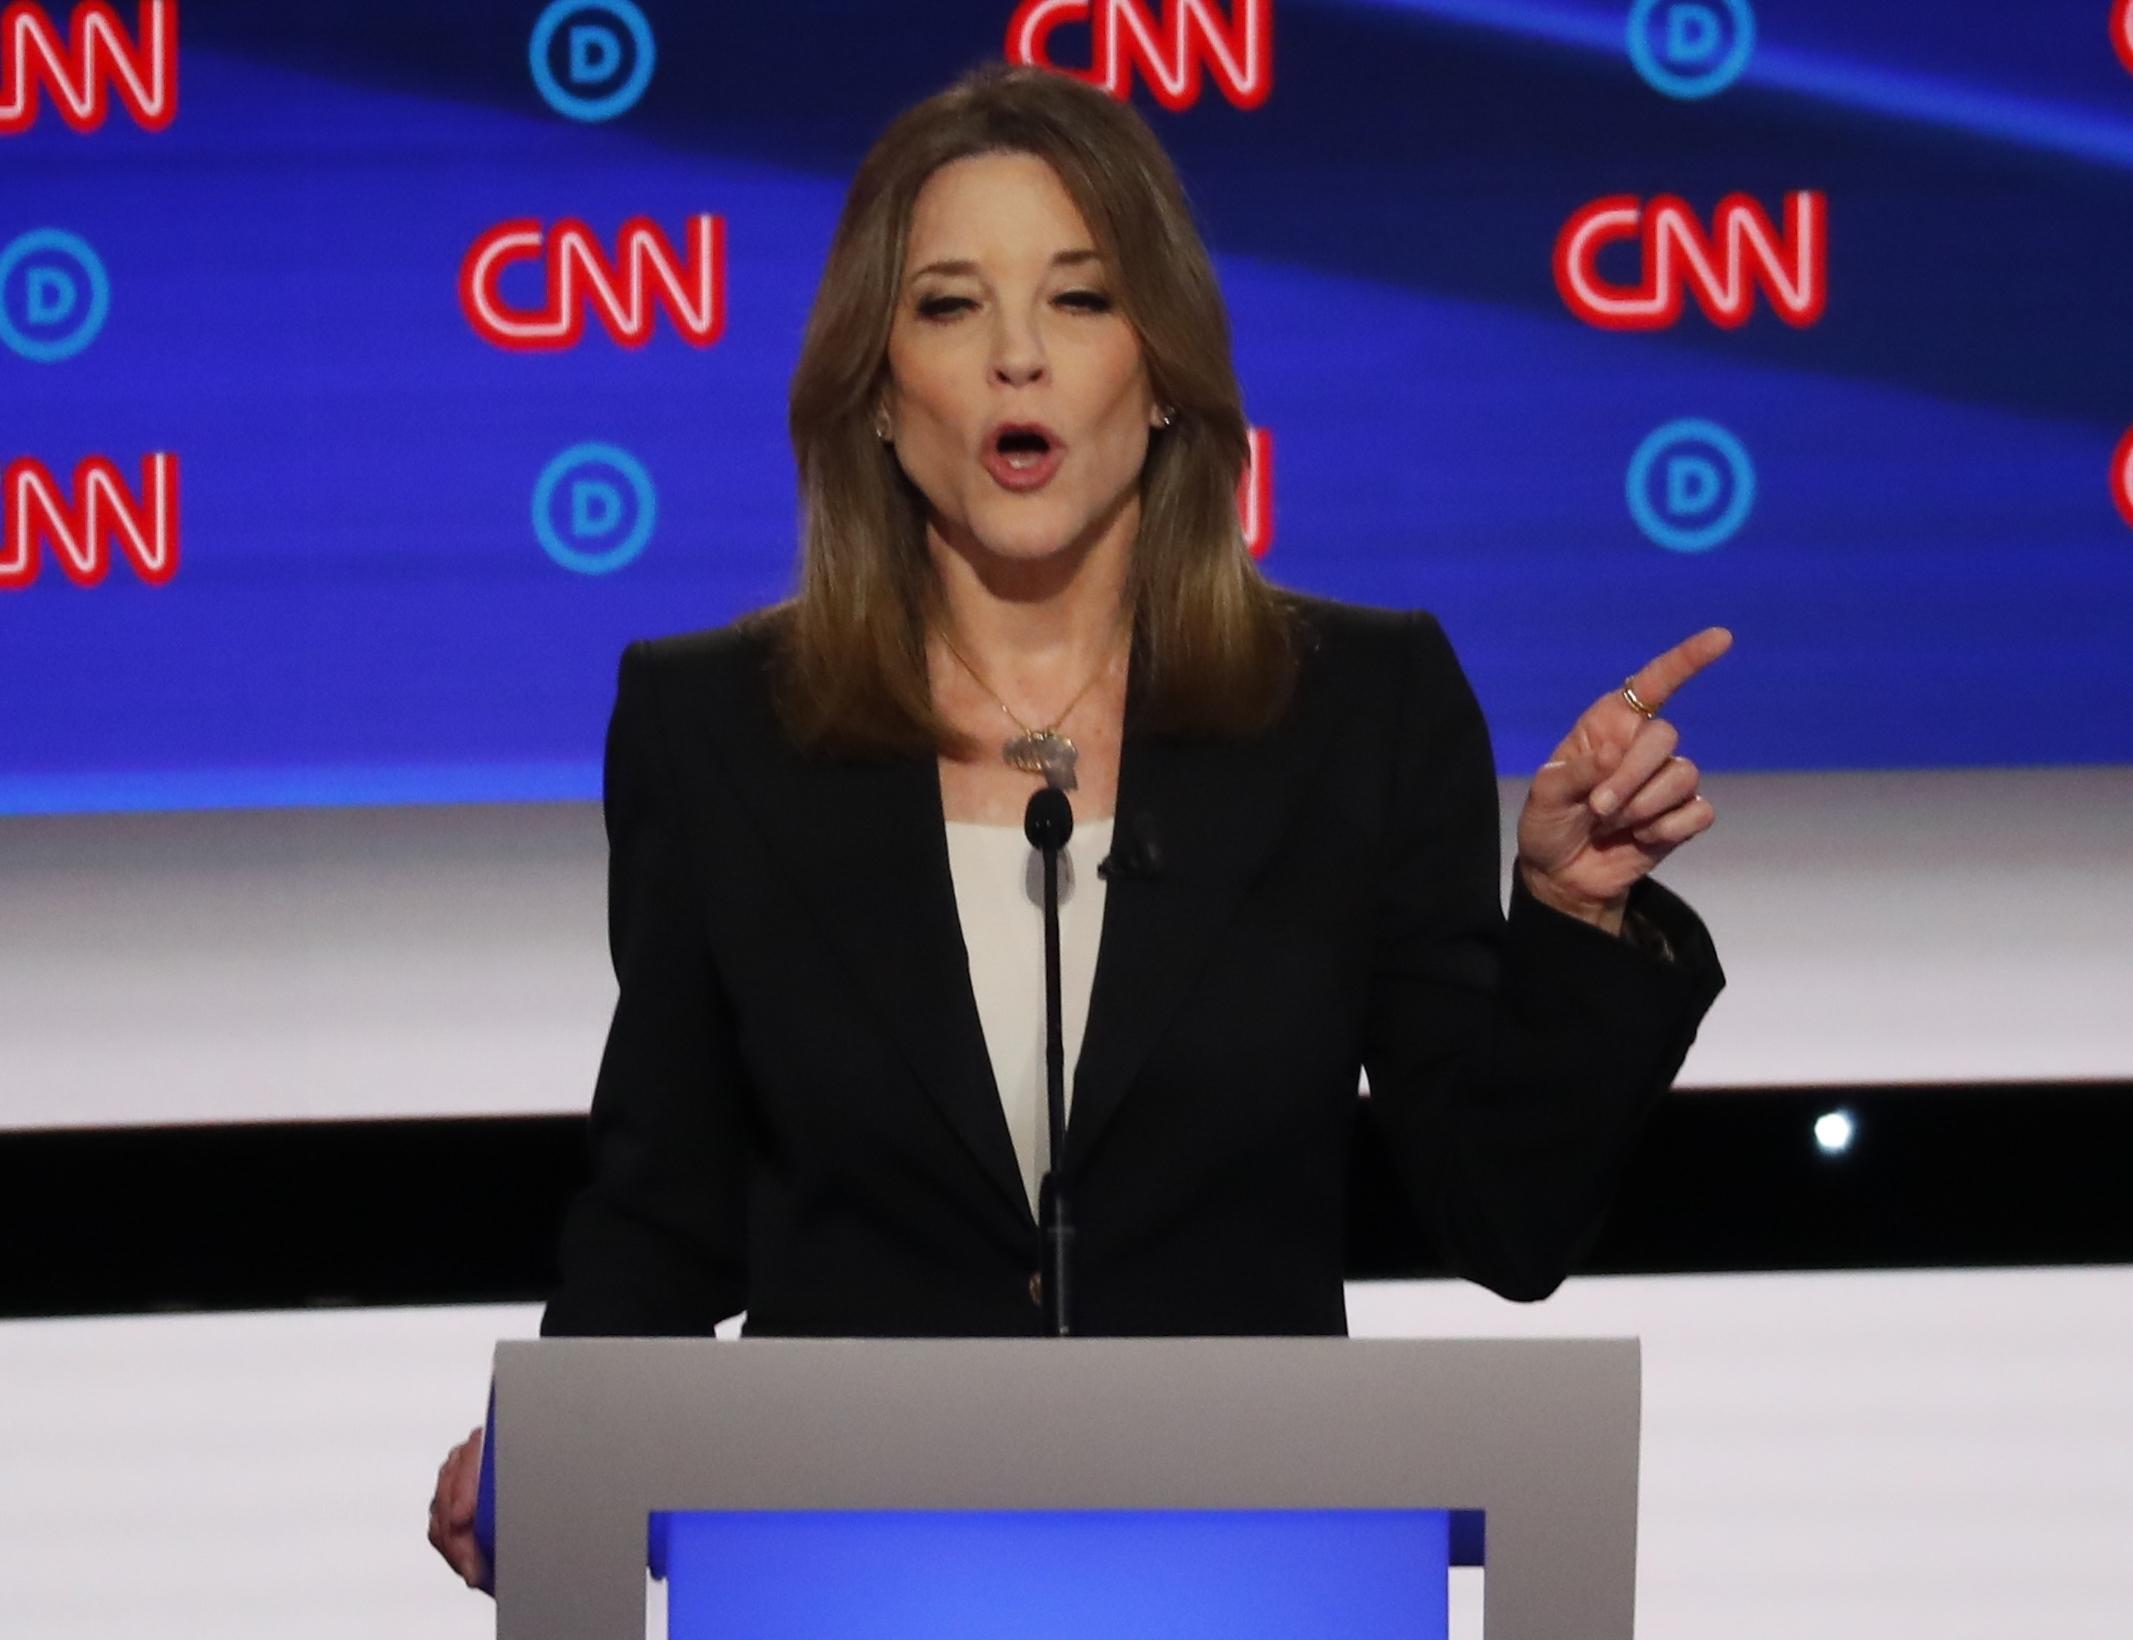 'This is amazing': Marianne Williamson winning Democratic debate, Donald Trump Jr. says